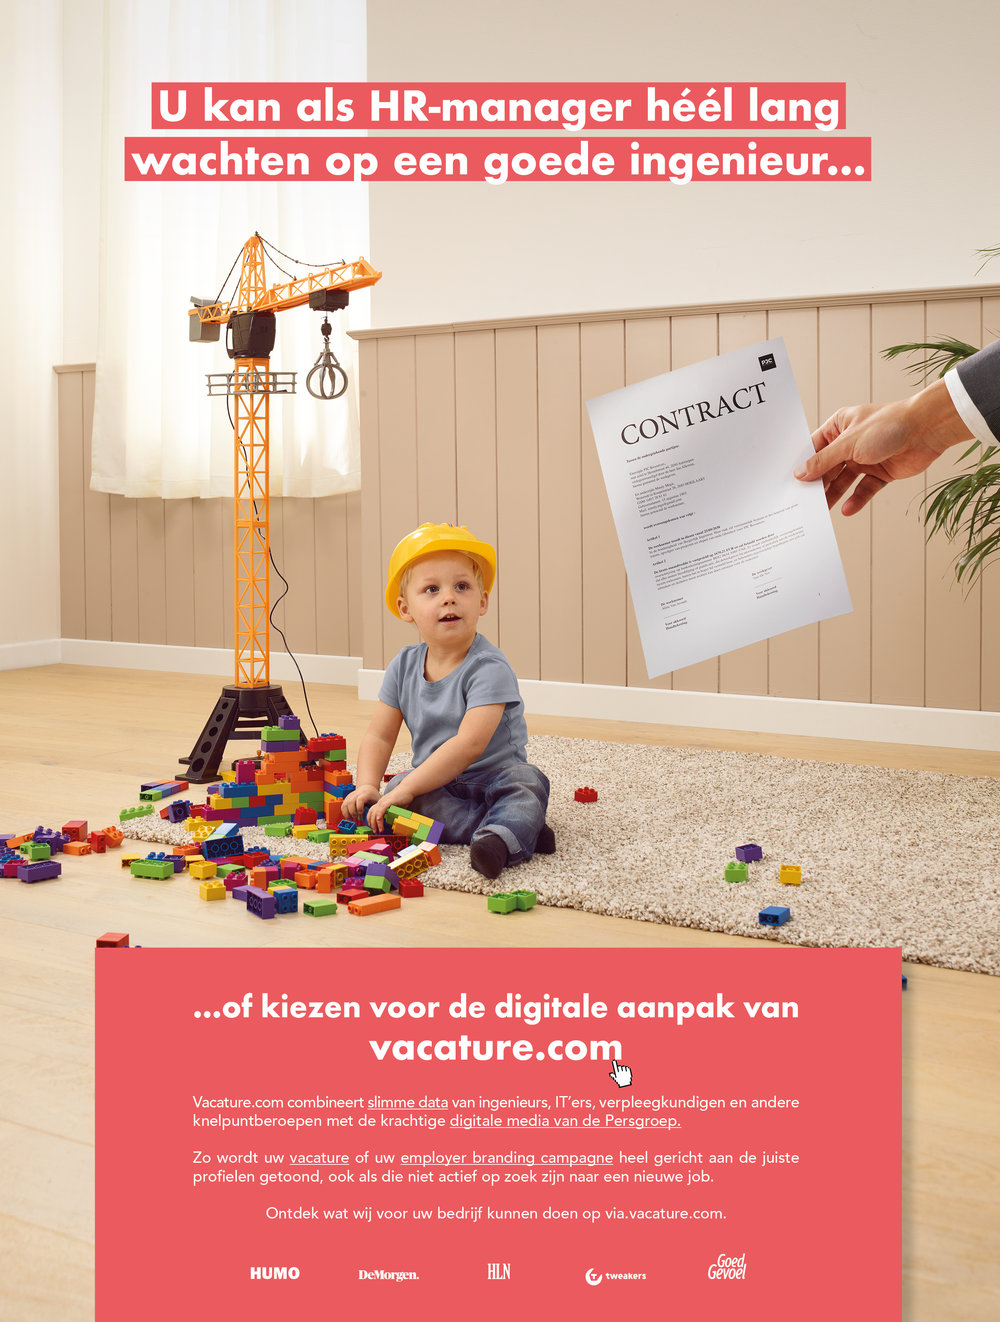 Vacature-knack_Ingenieur.jpg